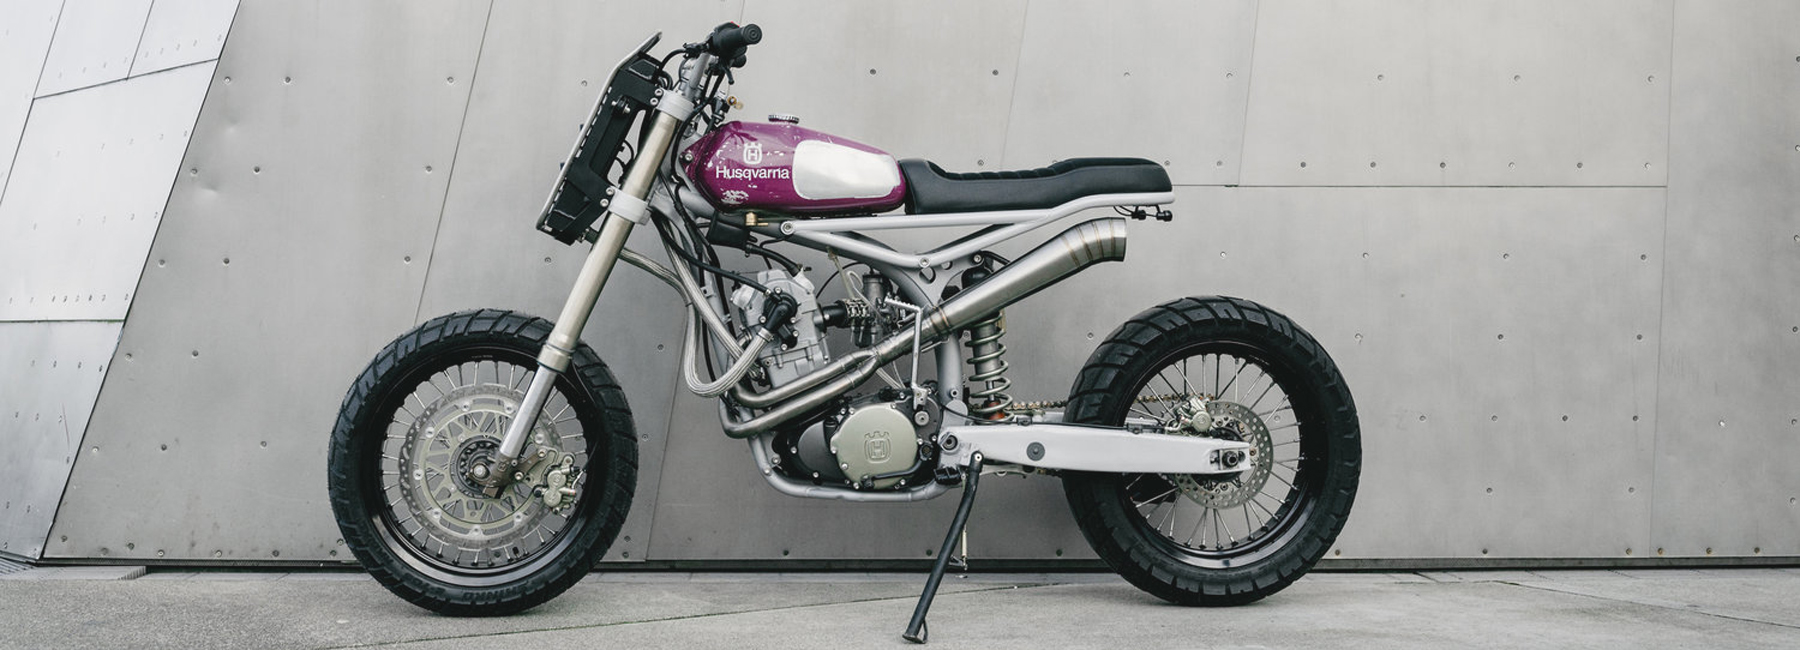 The Husqvarna Te570 Custom Motorcycle By Motomucci